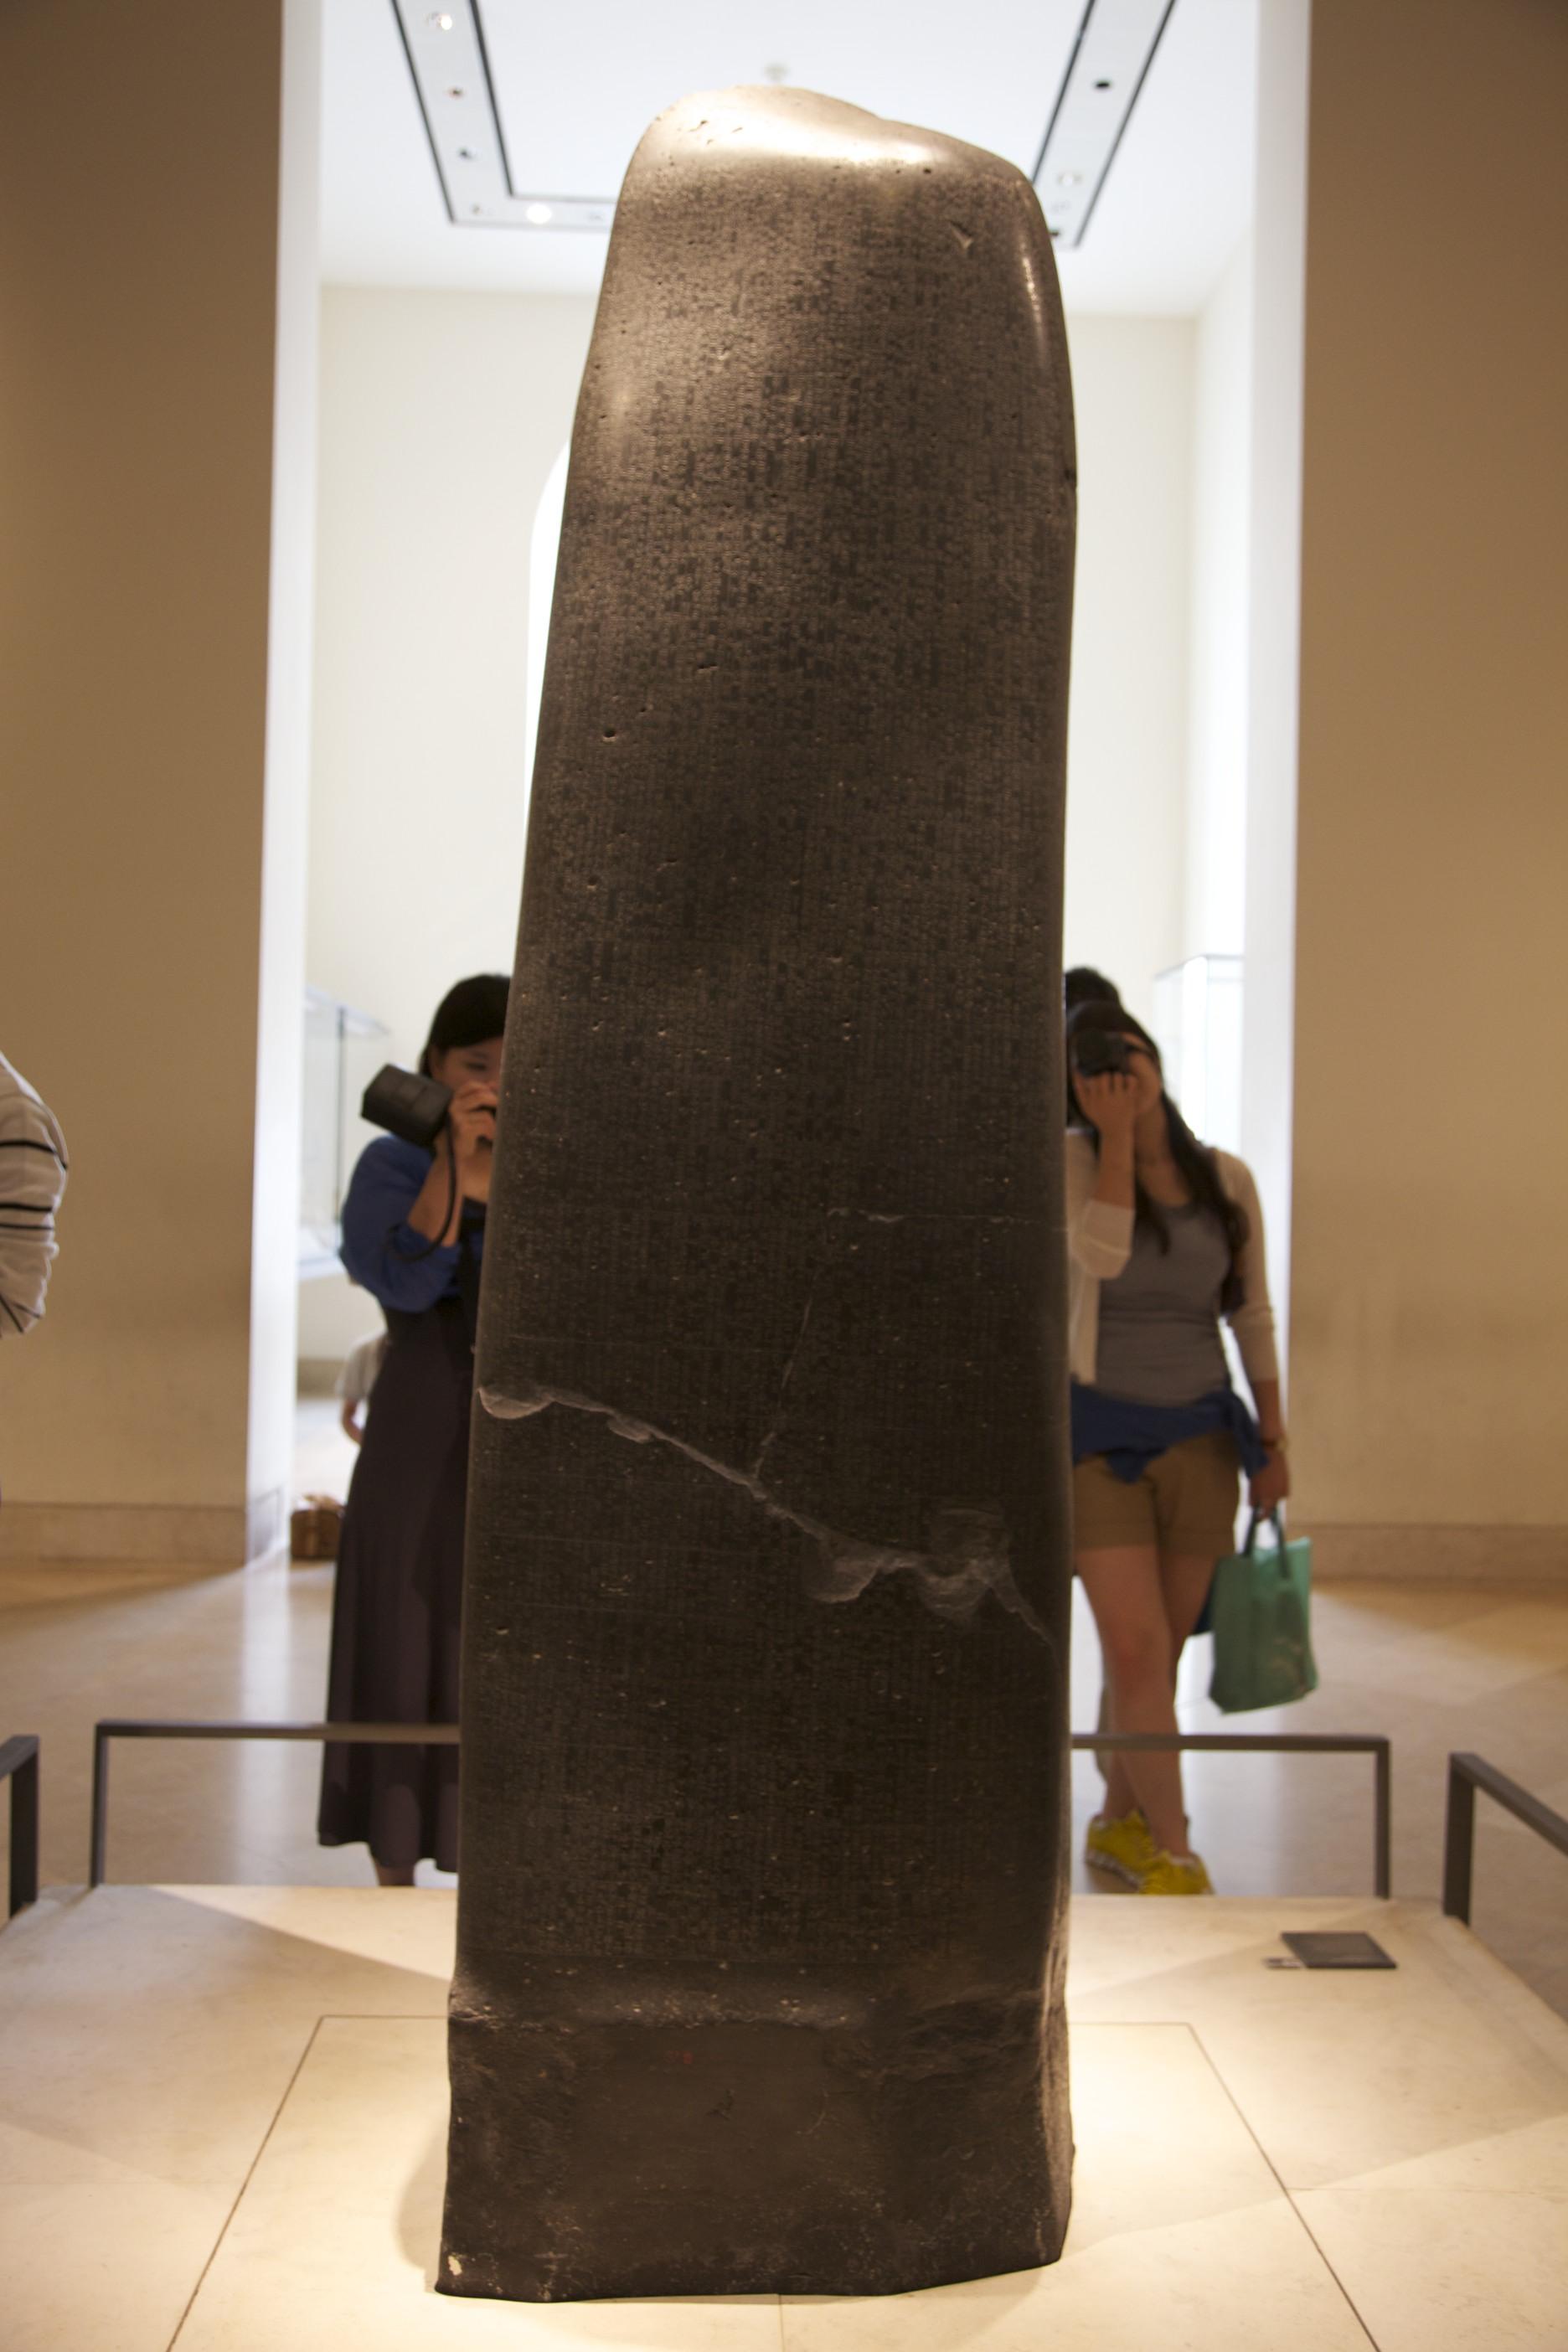 Hammurabi's Code, at Le Louvre.